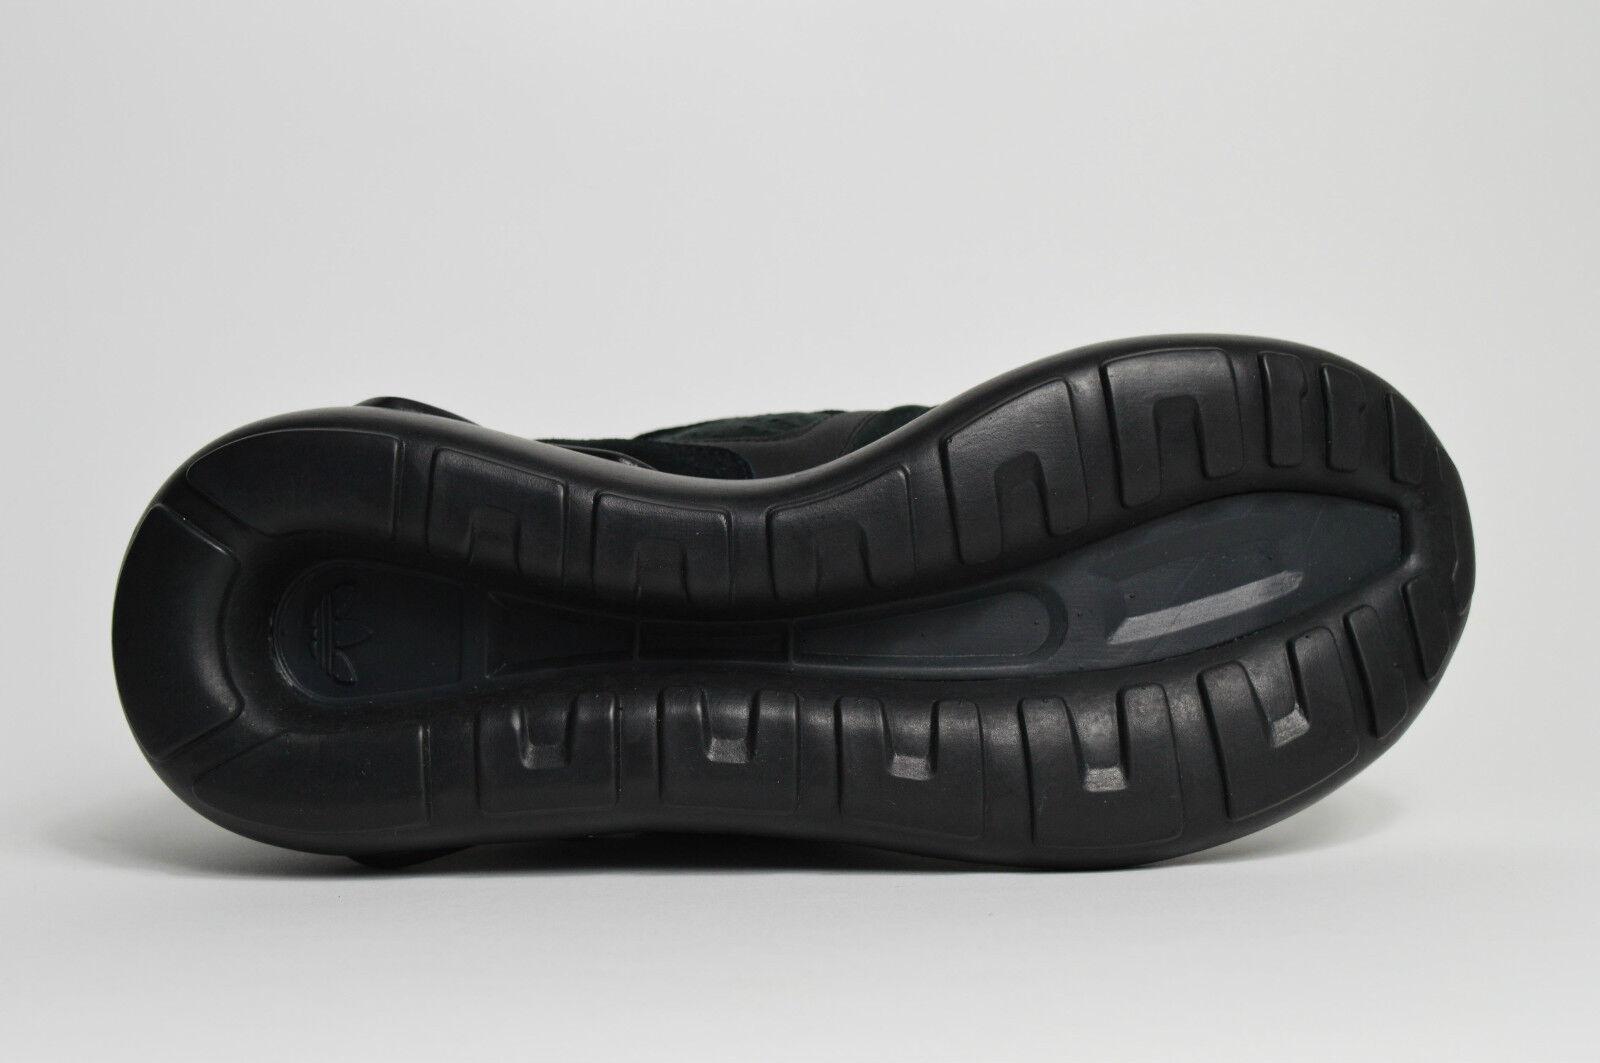 Adidas Tubular Runner Suede BLACKOUT Neu All Suede Runner max atmos yeezy boost zx a546c5